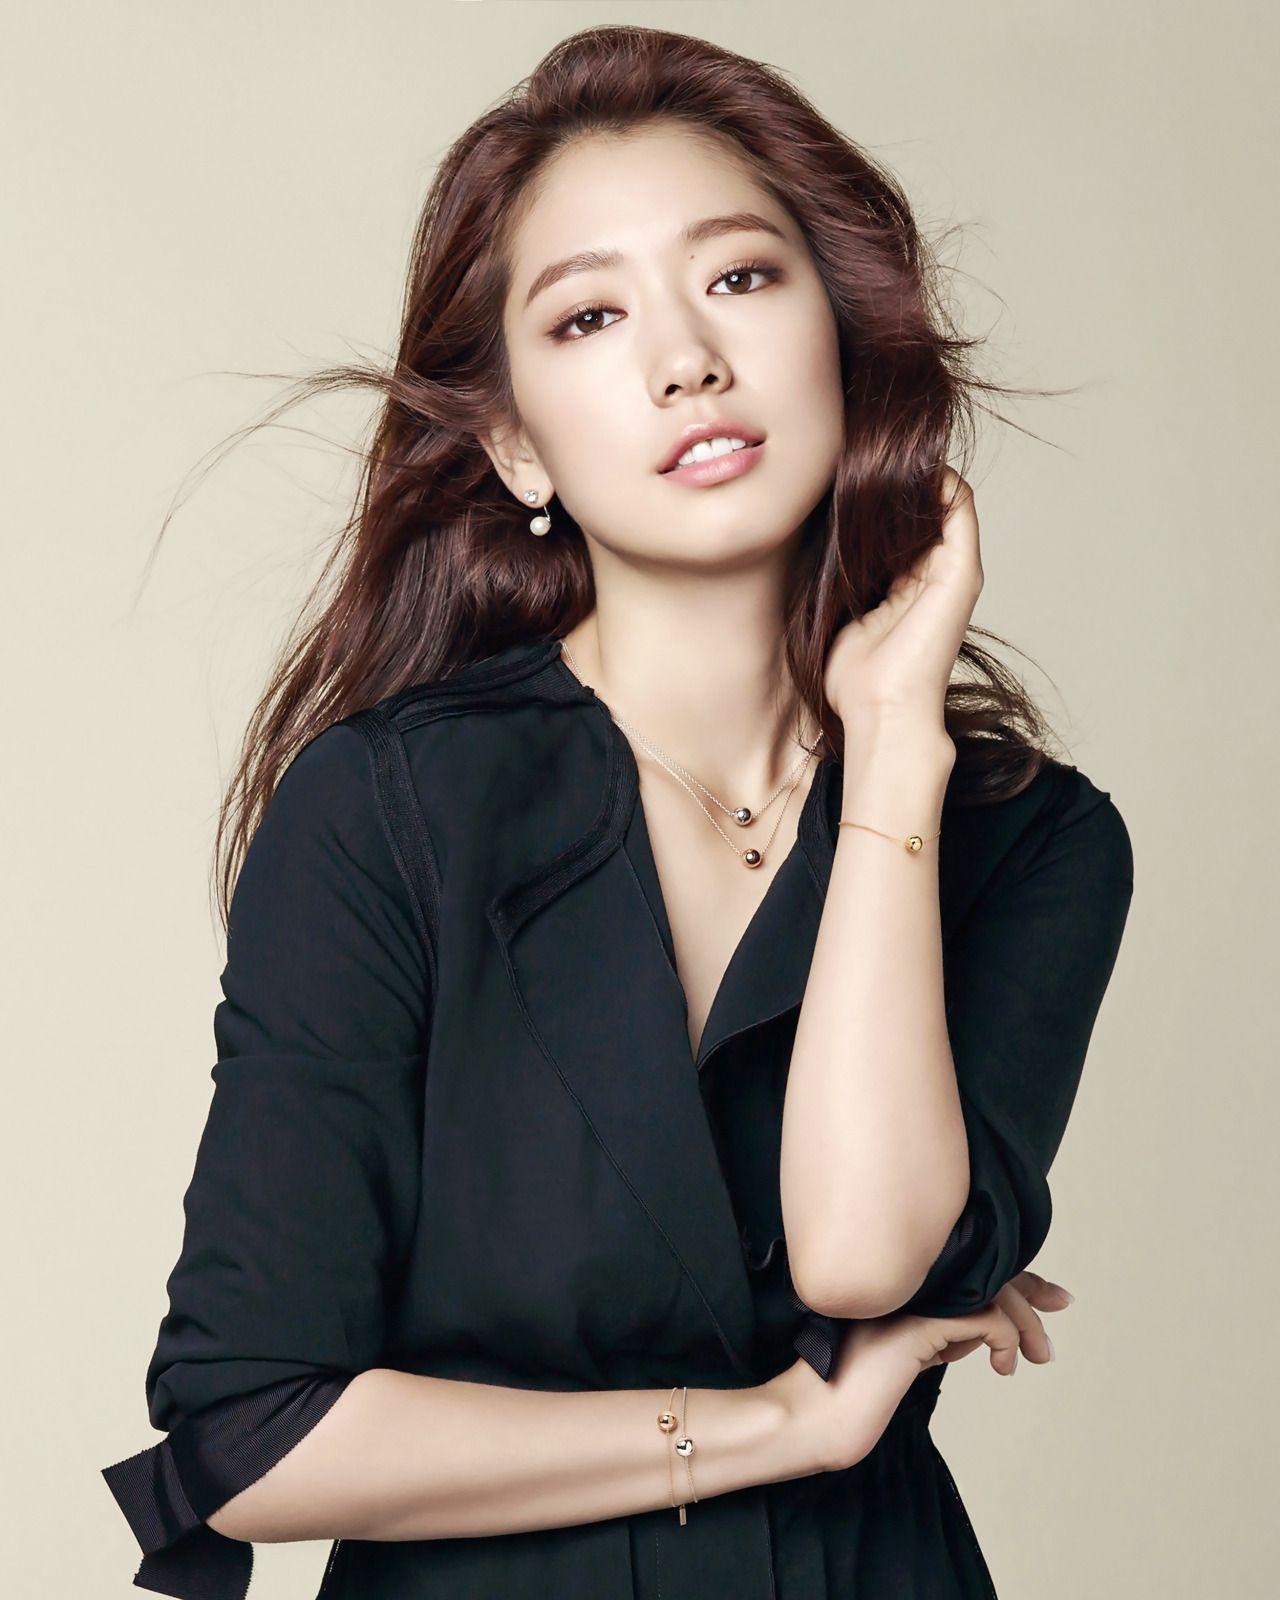 KPOPHQPICTURES : Photo | Park shin hye, Korean model